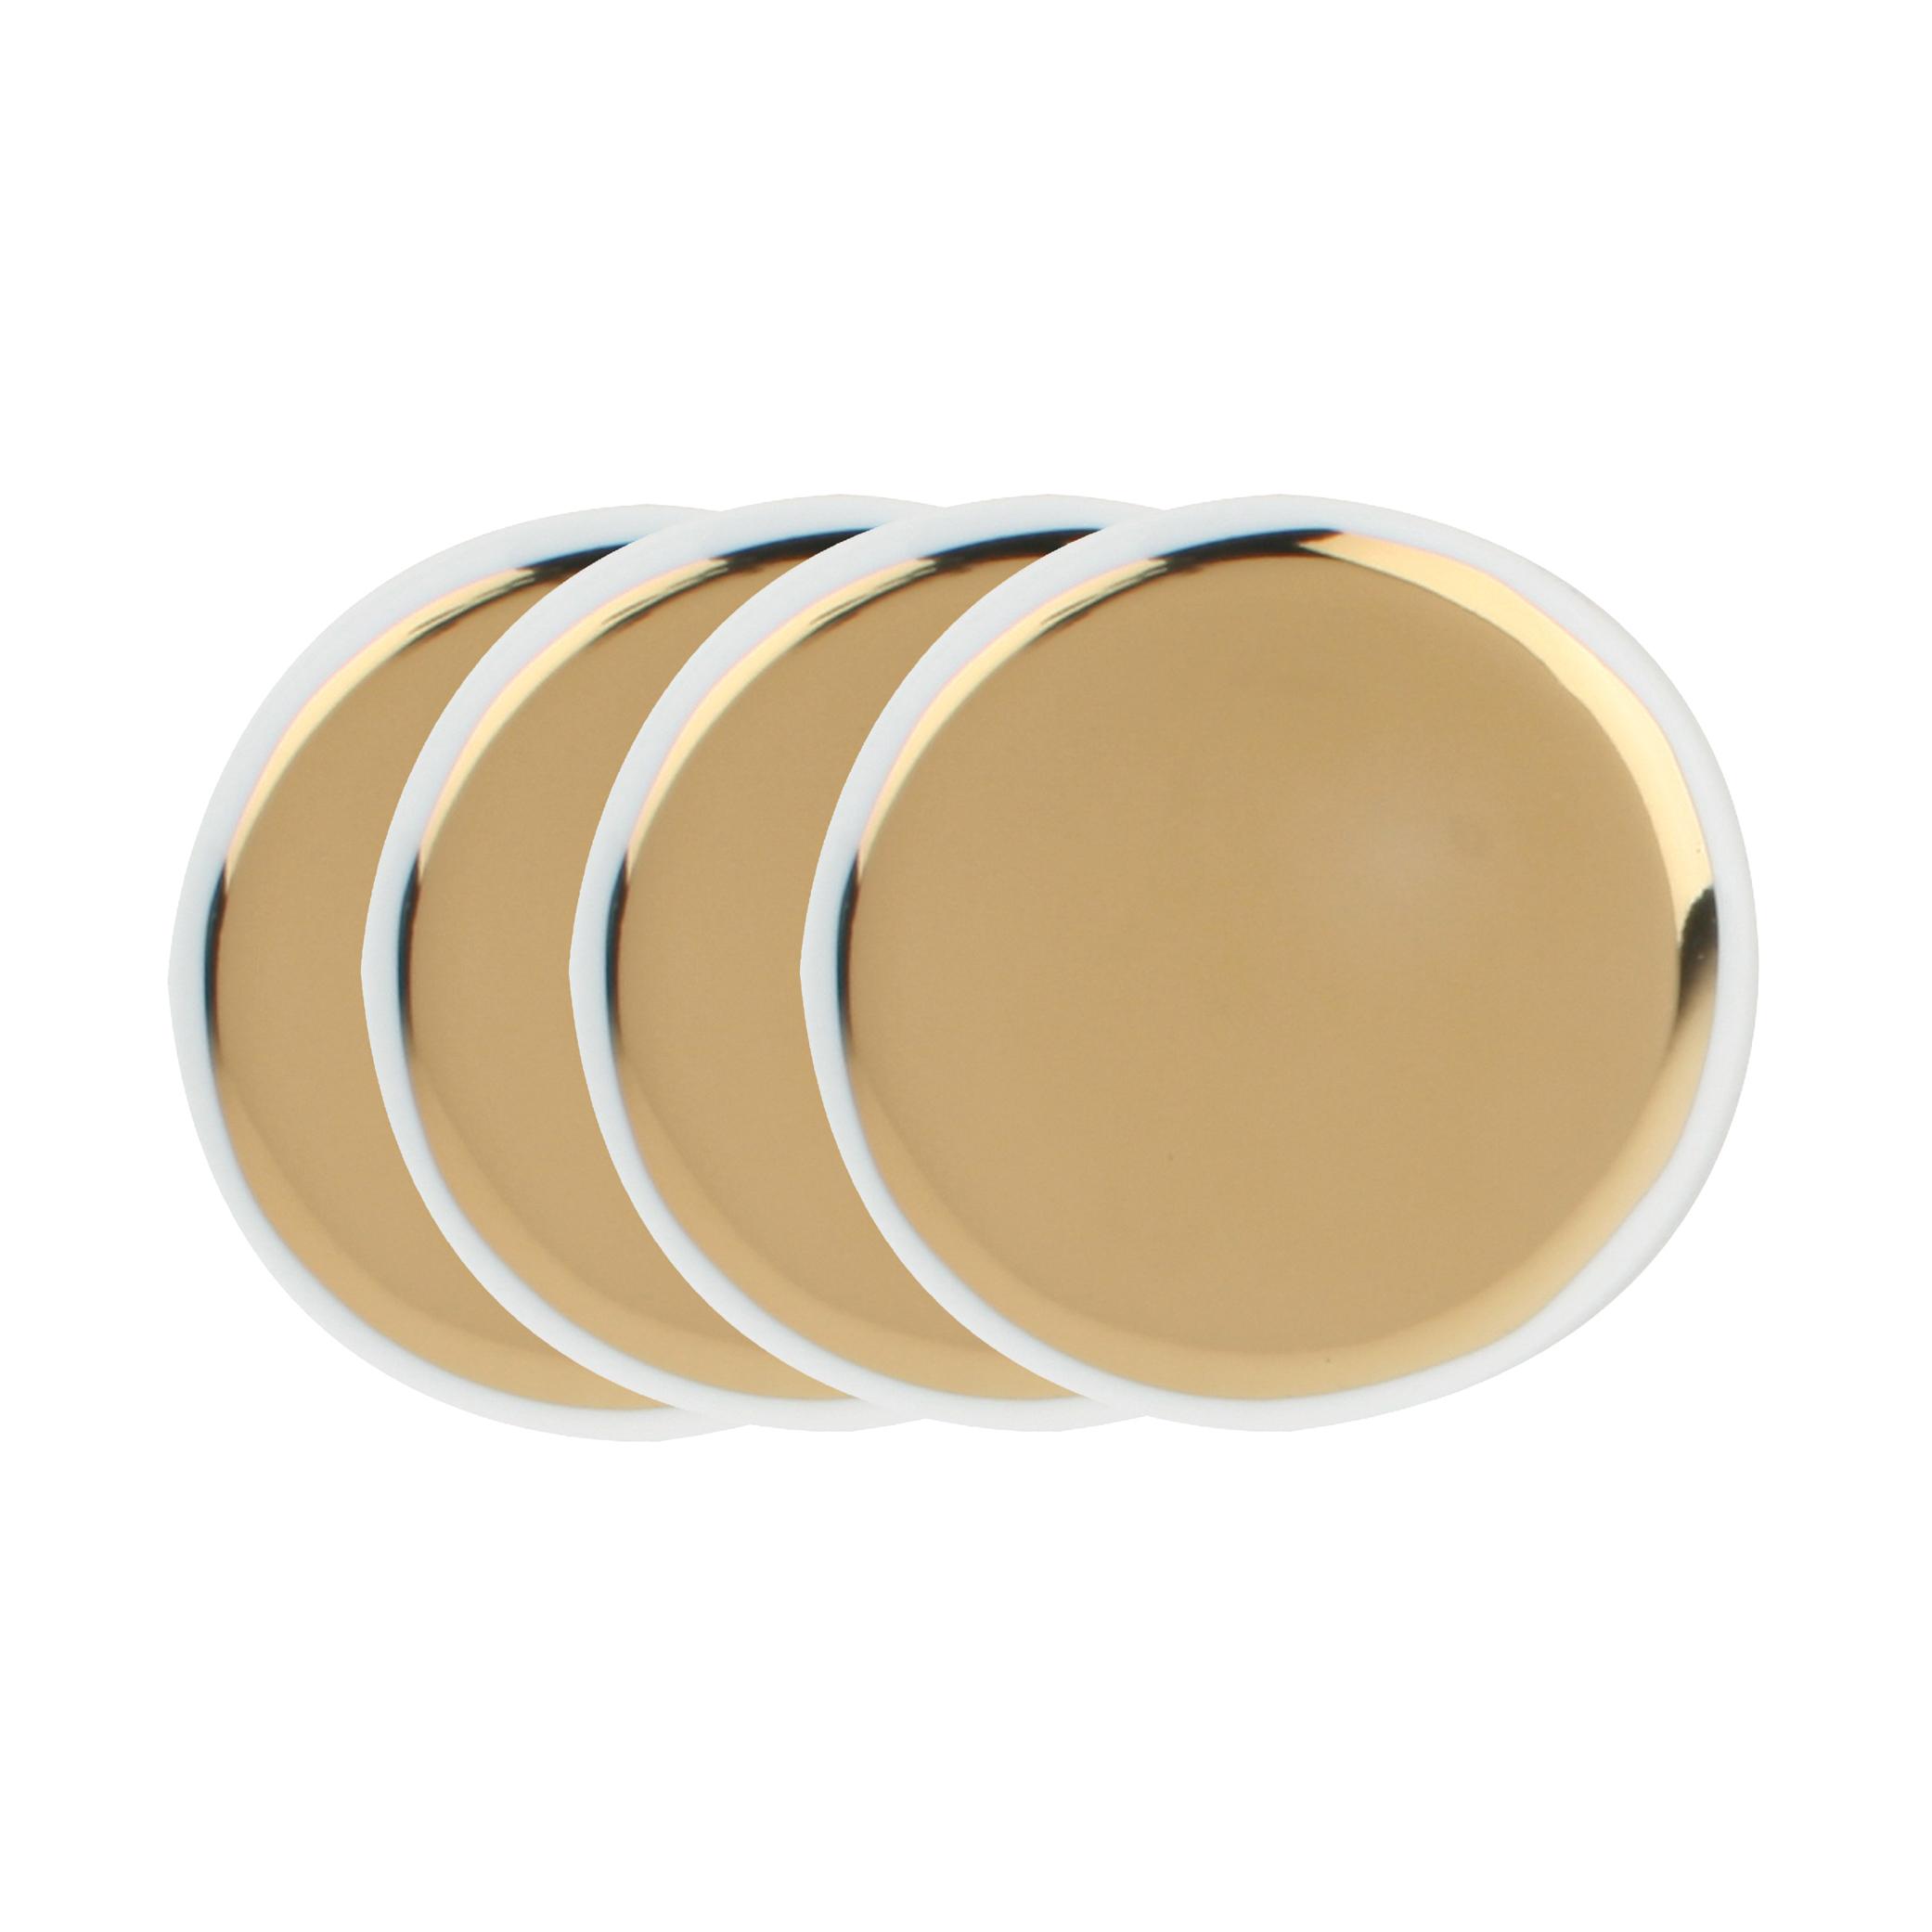 Dauville Regency Gold Ceramic Coasters - Set of 4